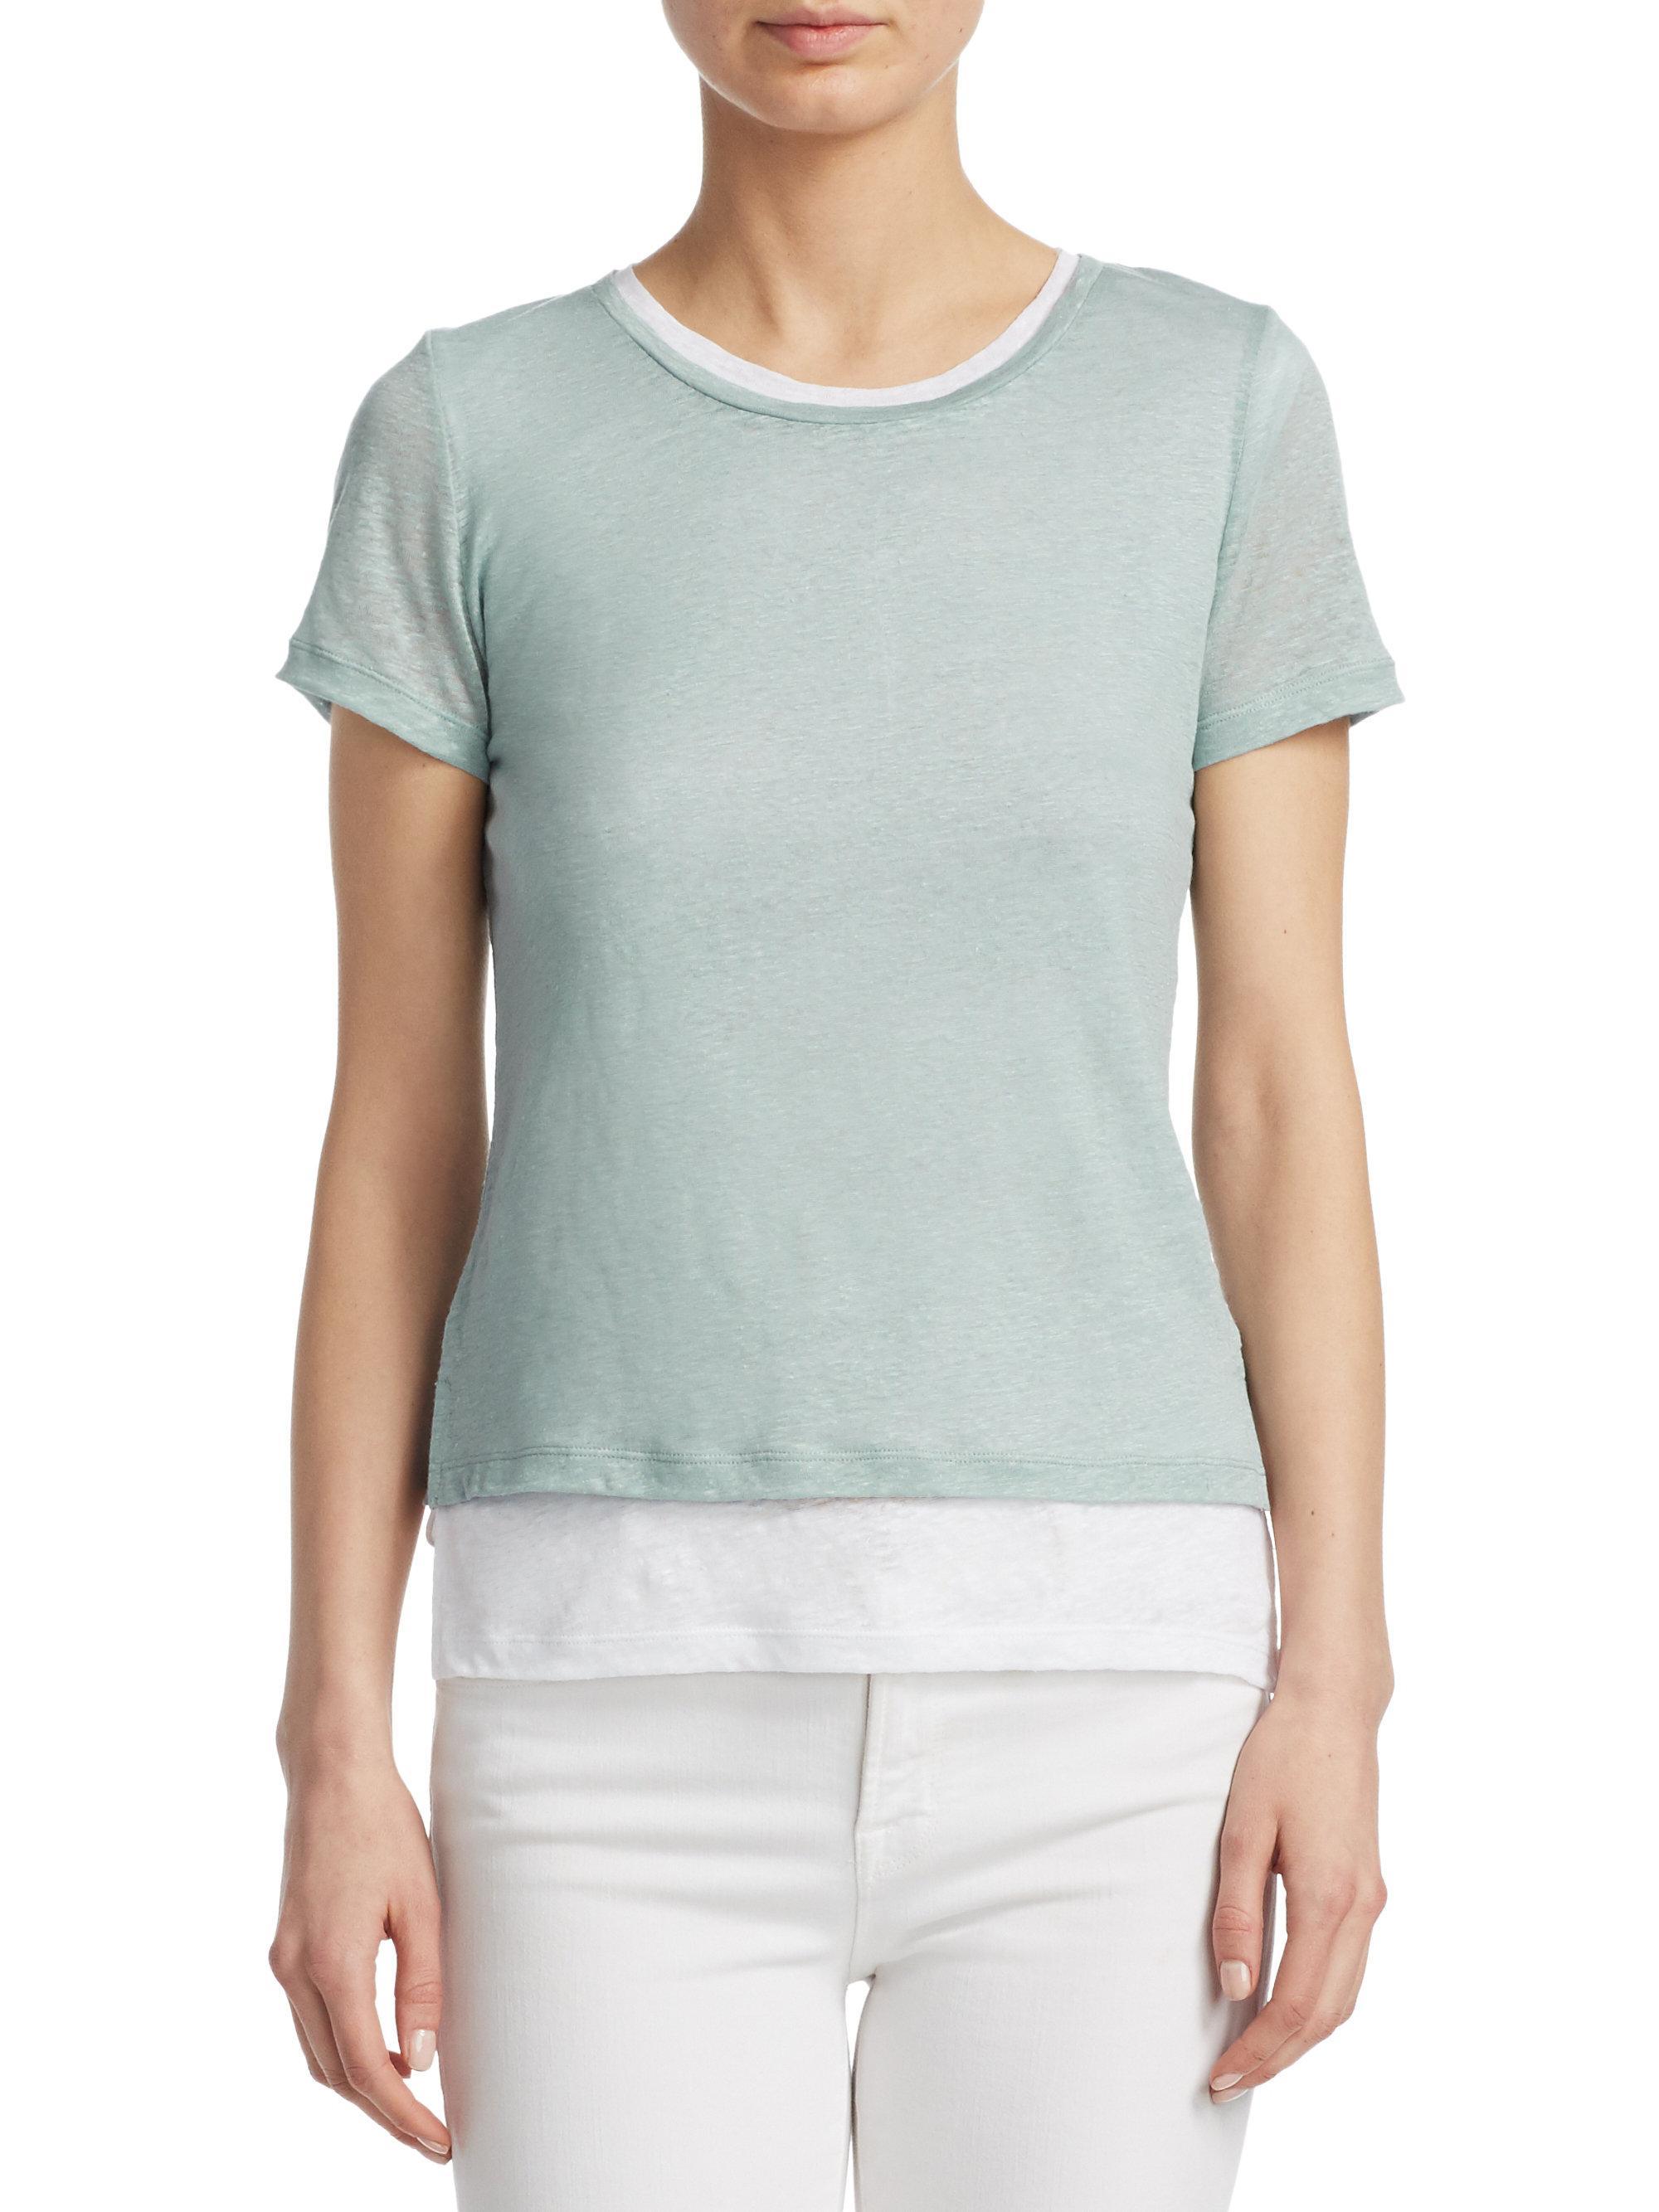 Majestic Filatures Woman Striped Slub Linen-jersey T-shirt Off-white Size 5 Majestic Filatures Clearance Shop Offer 100% Guaranteed New Arrival Deals gURCMzhu